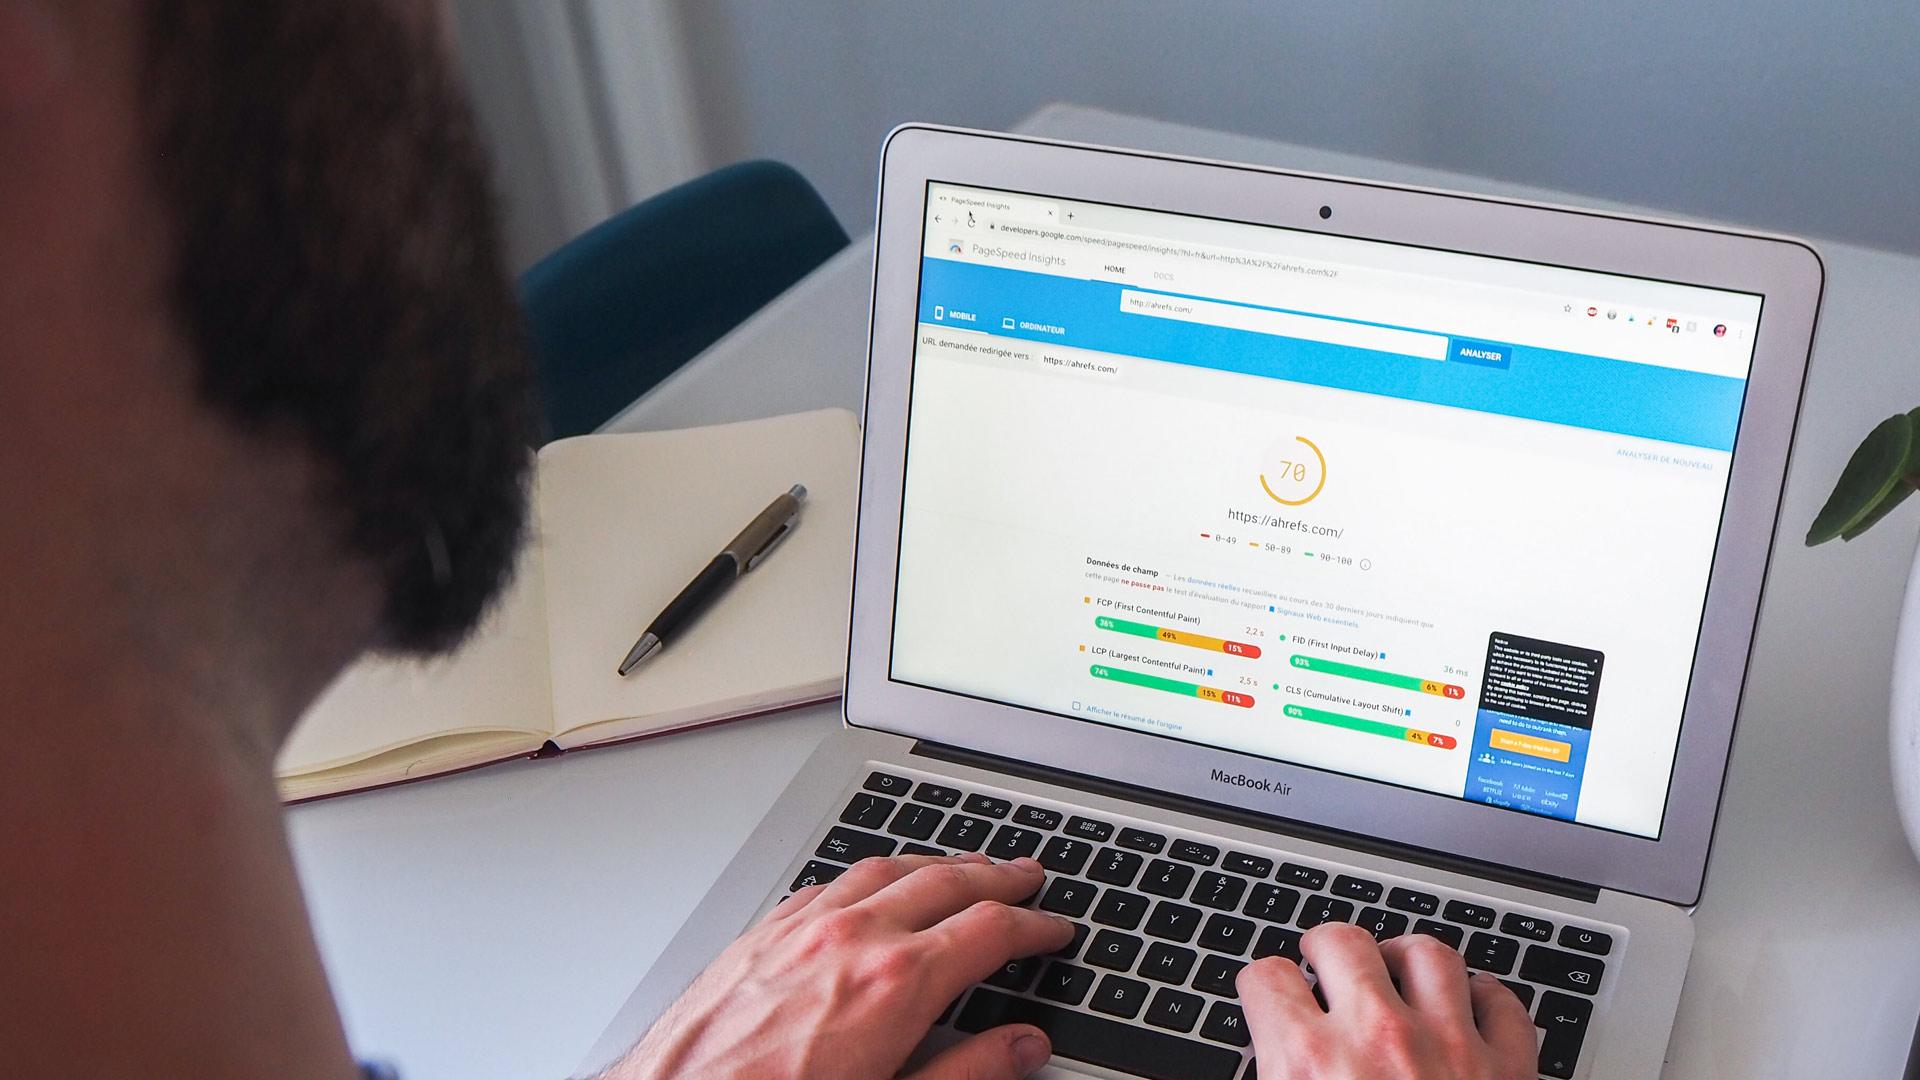 Core web vitals test by Google